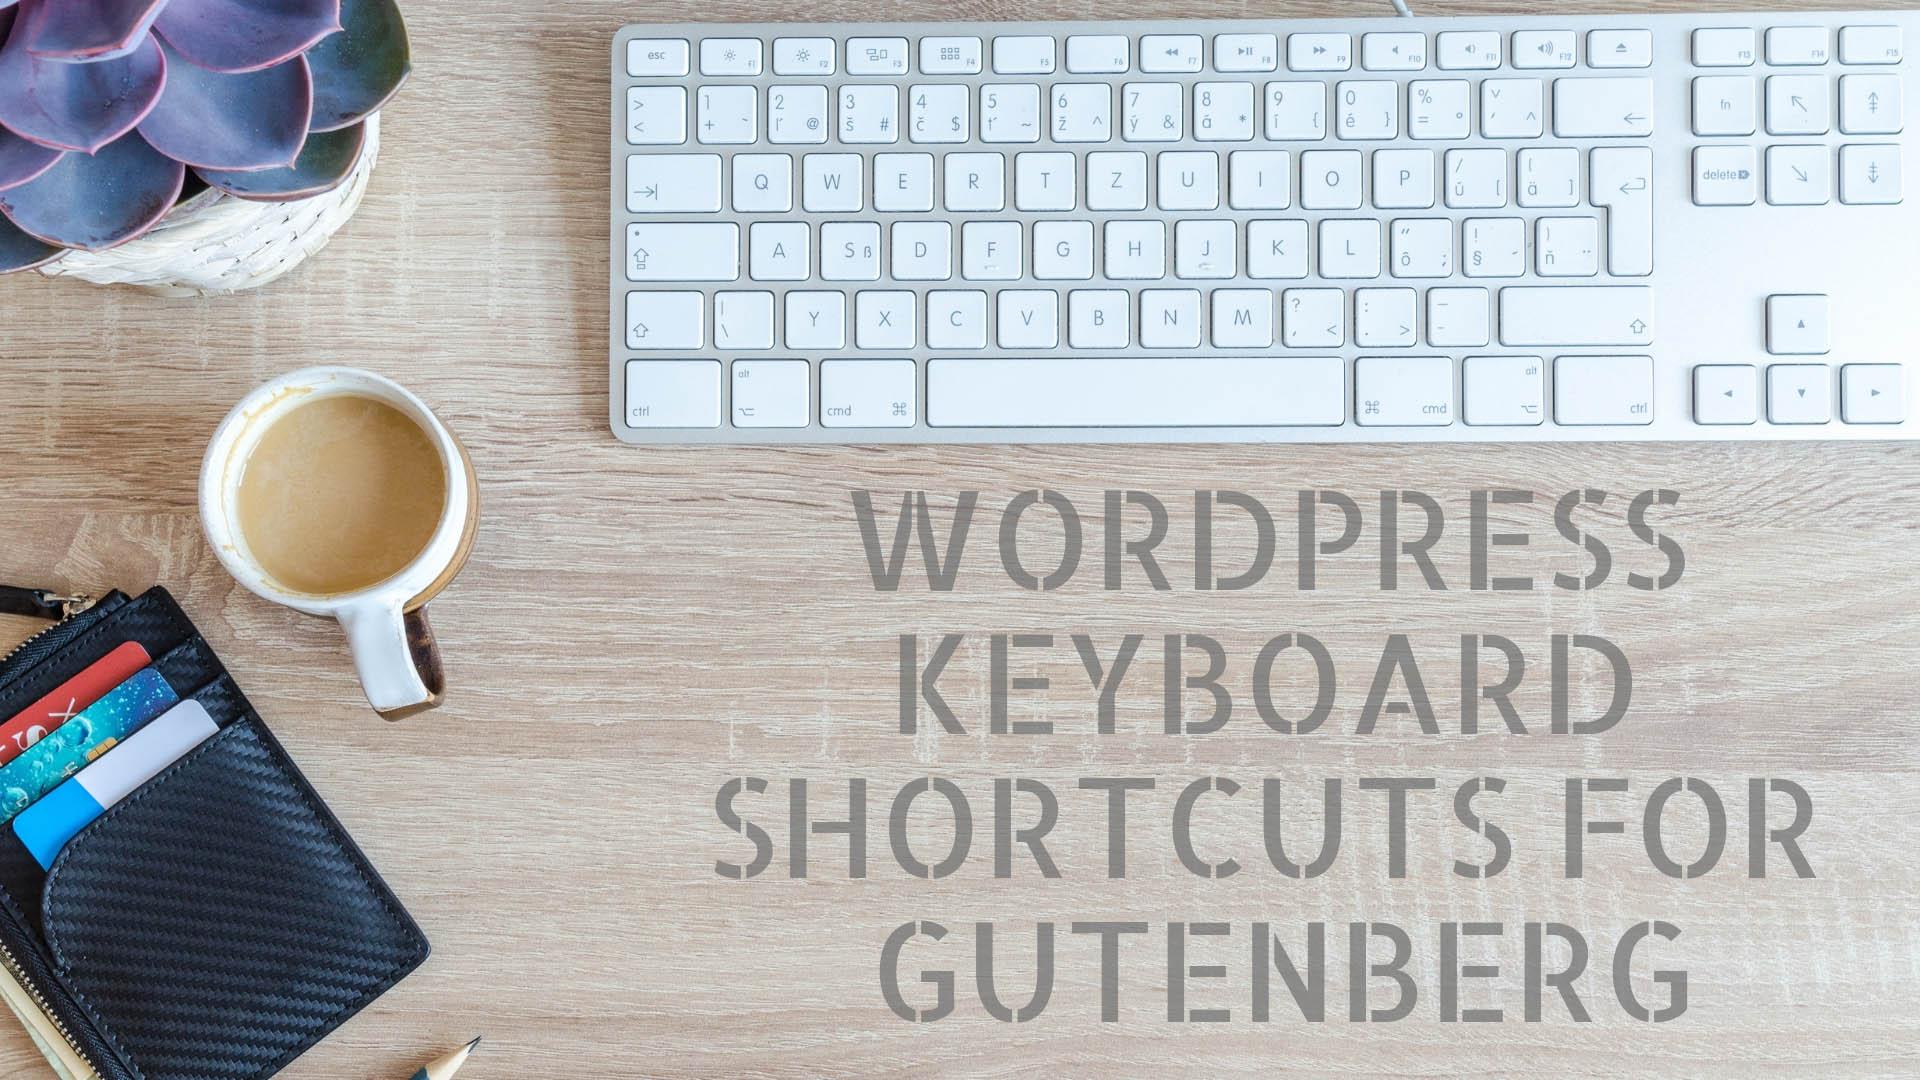 Gutenberg Keyboard Shortcuts